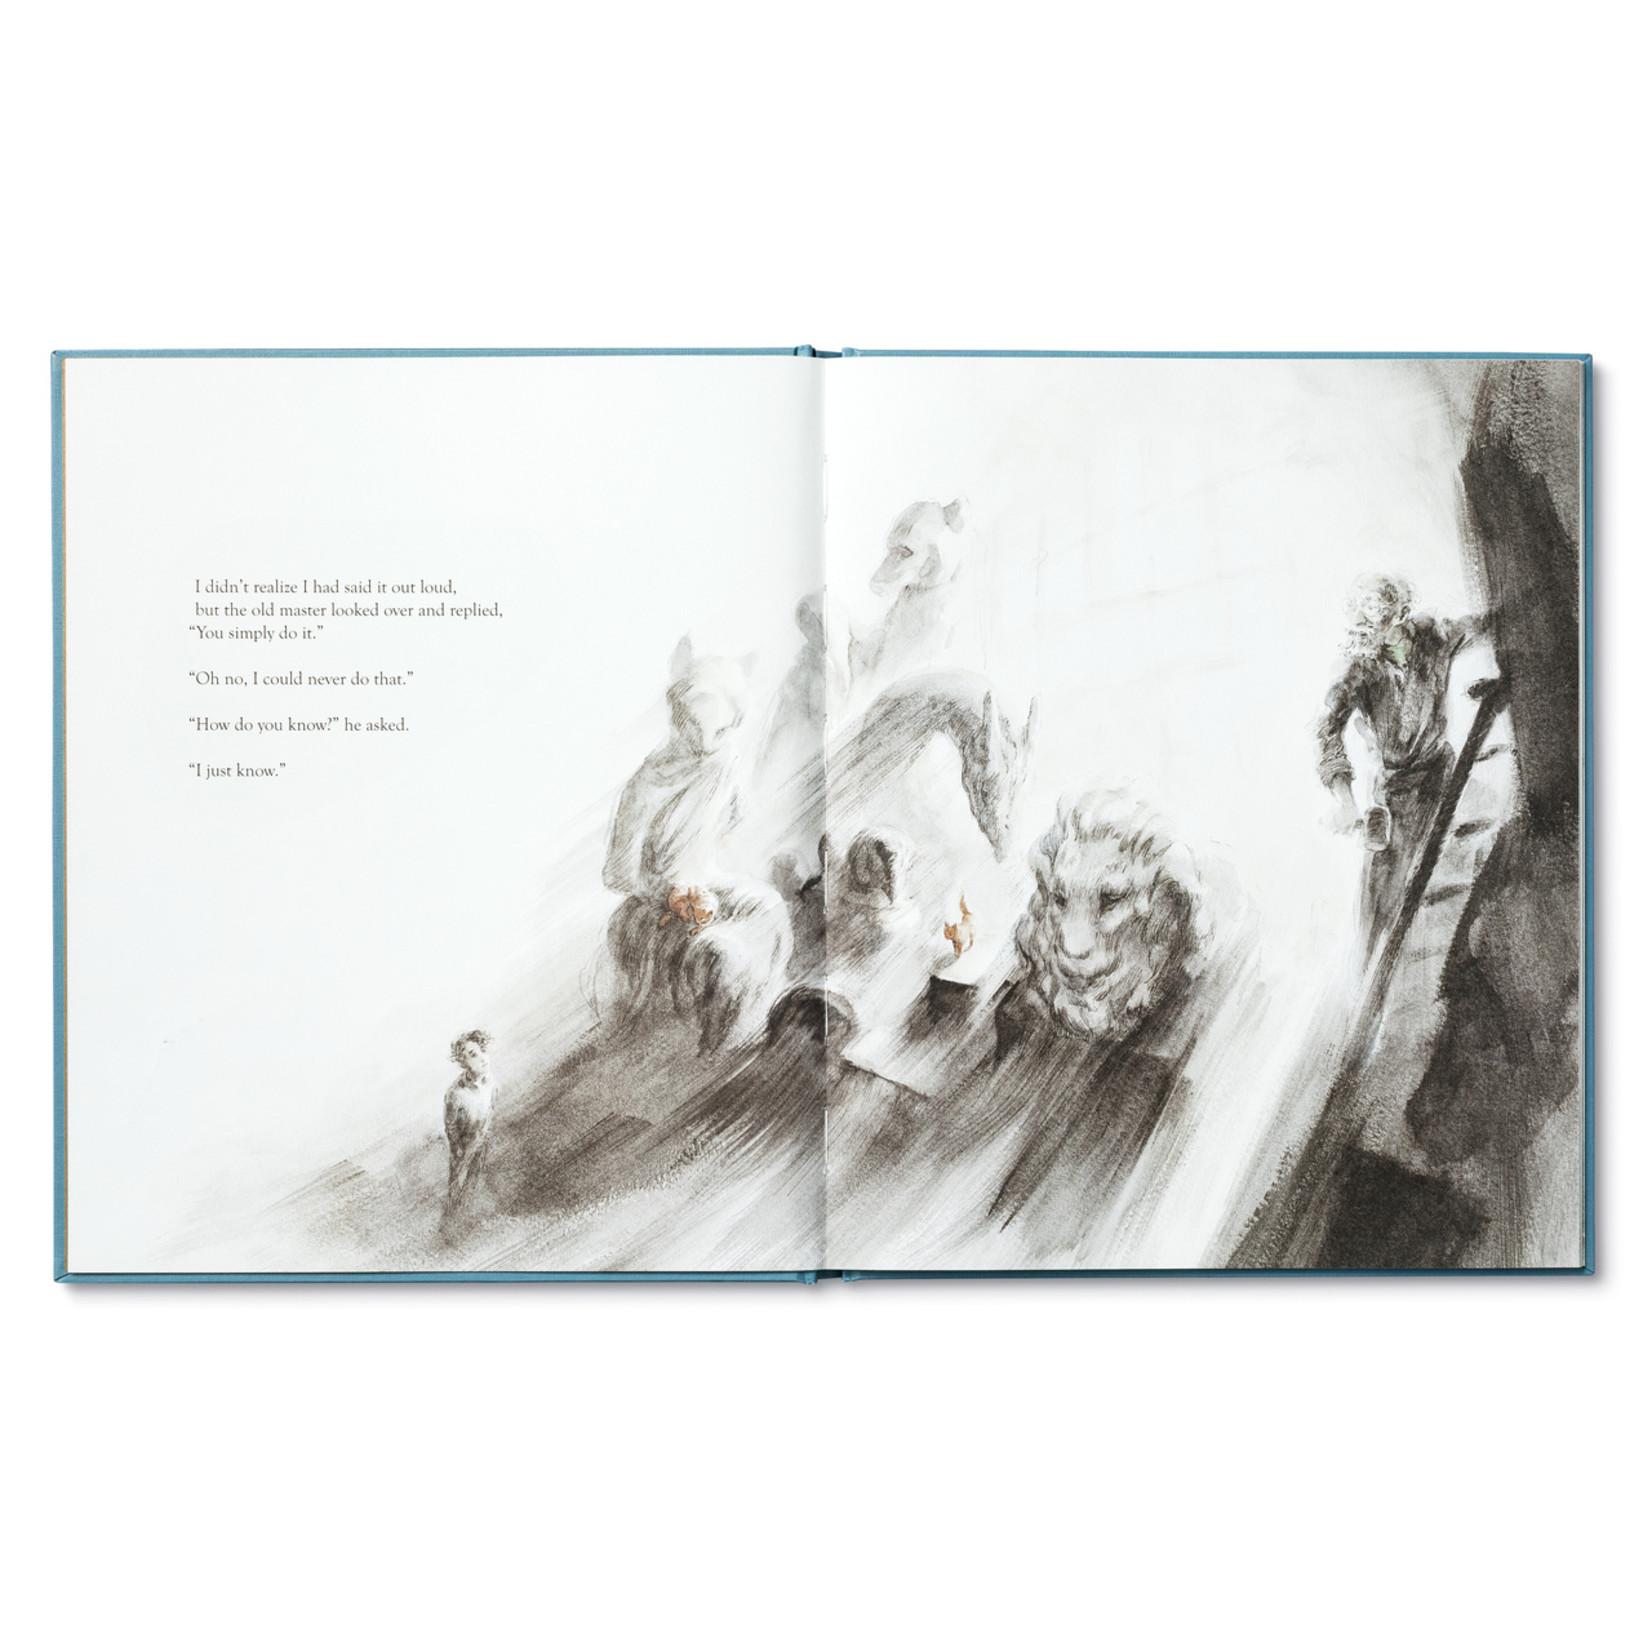 COMPENDIUM ILLUSTRATED BOOK - TRYING